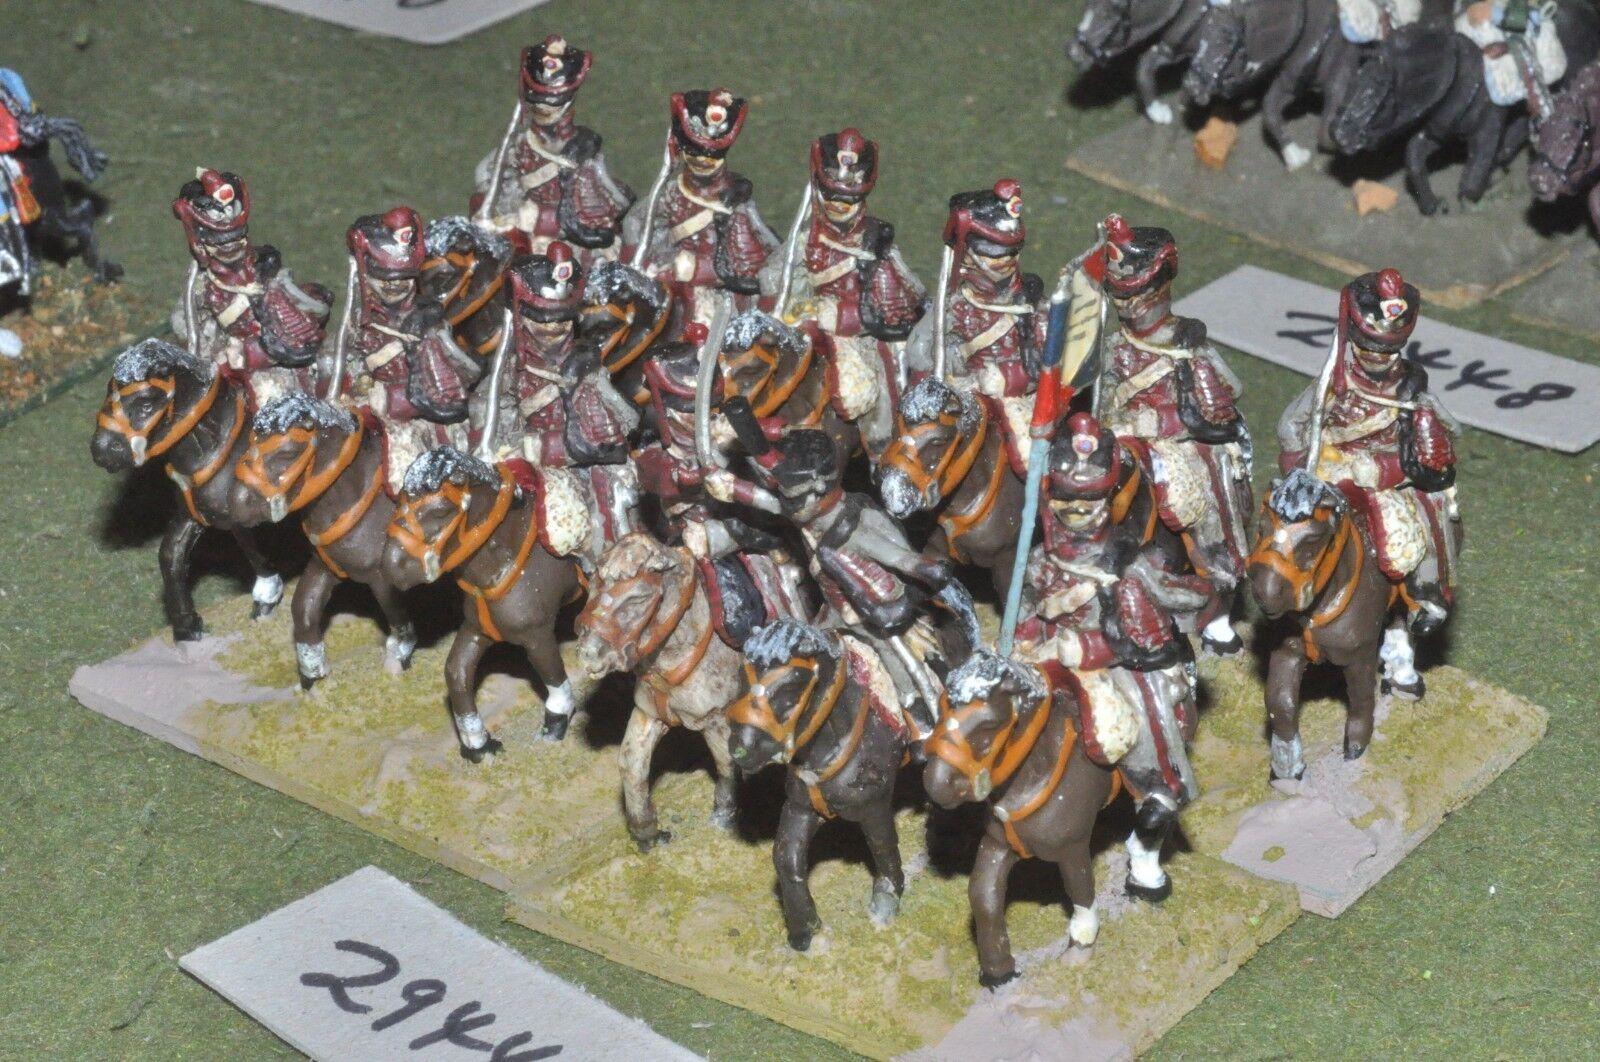 25mm napoleonic   french - hussars 12 figures - cav (29449)